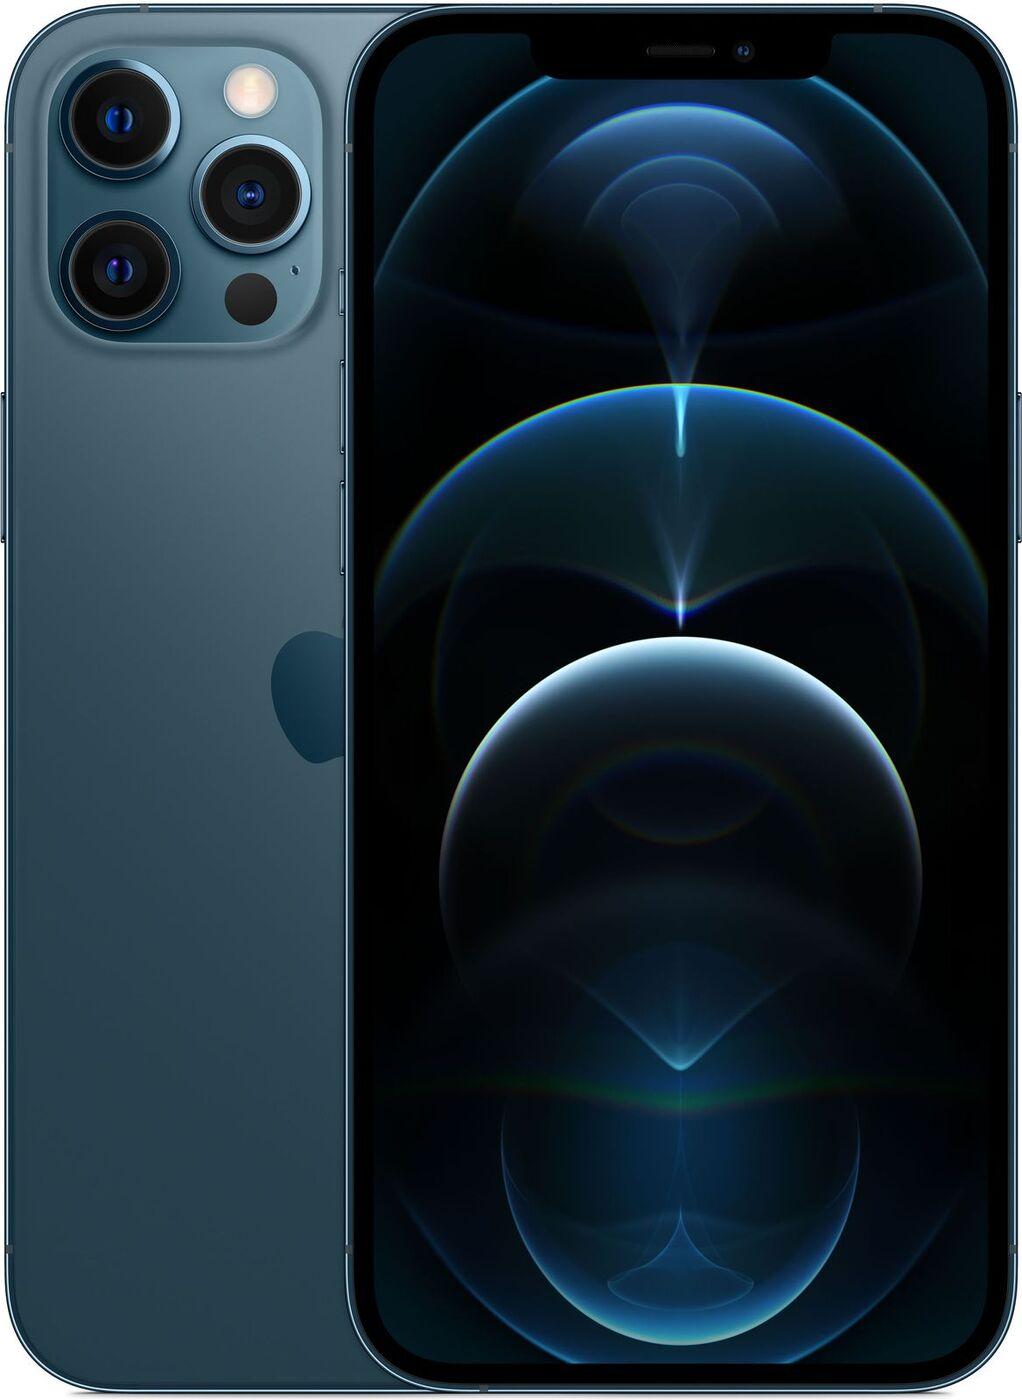 смартфон apple iphone 12 pro max 256gb blue уцененный товар (№19)